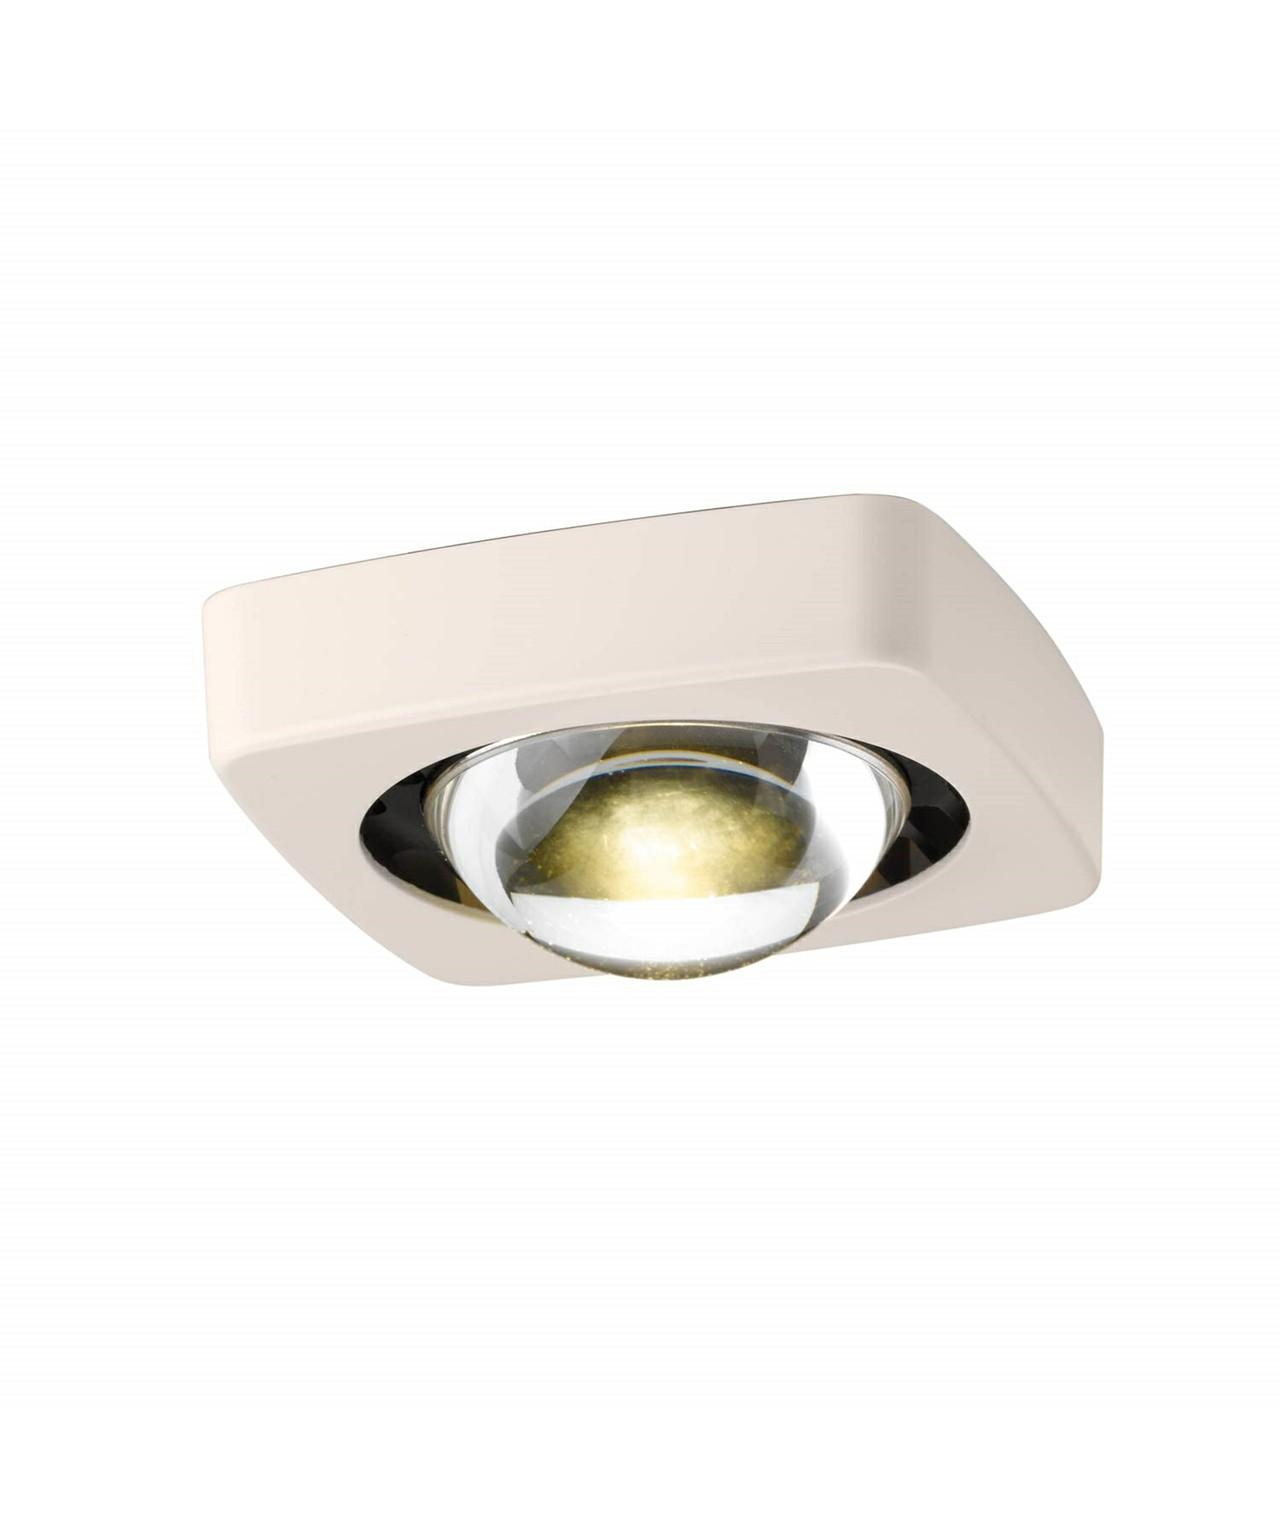 Kelveen Loftlampe/Væglampe Monted 40° - Oligo thumbnail